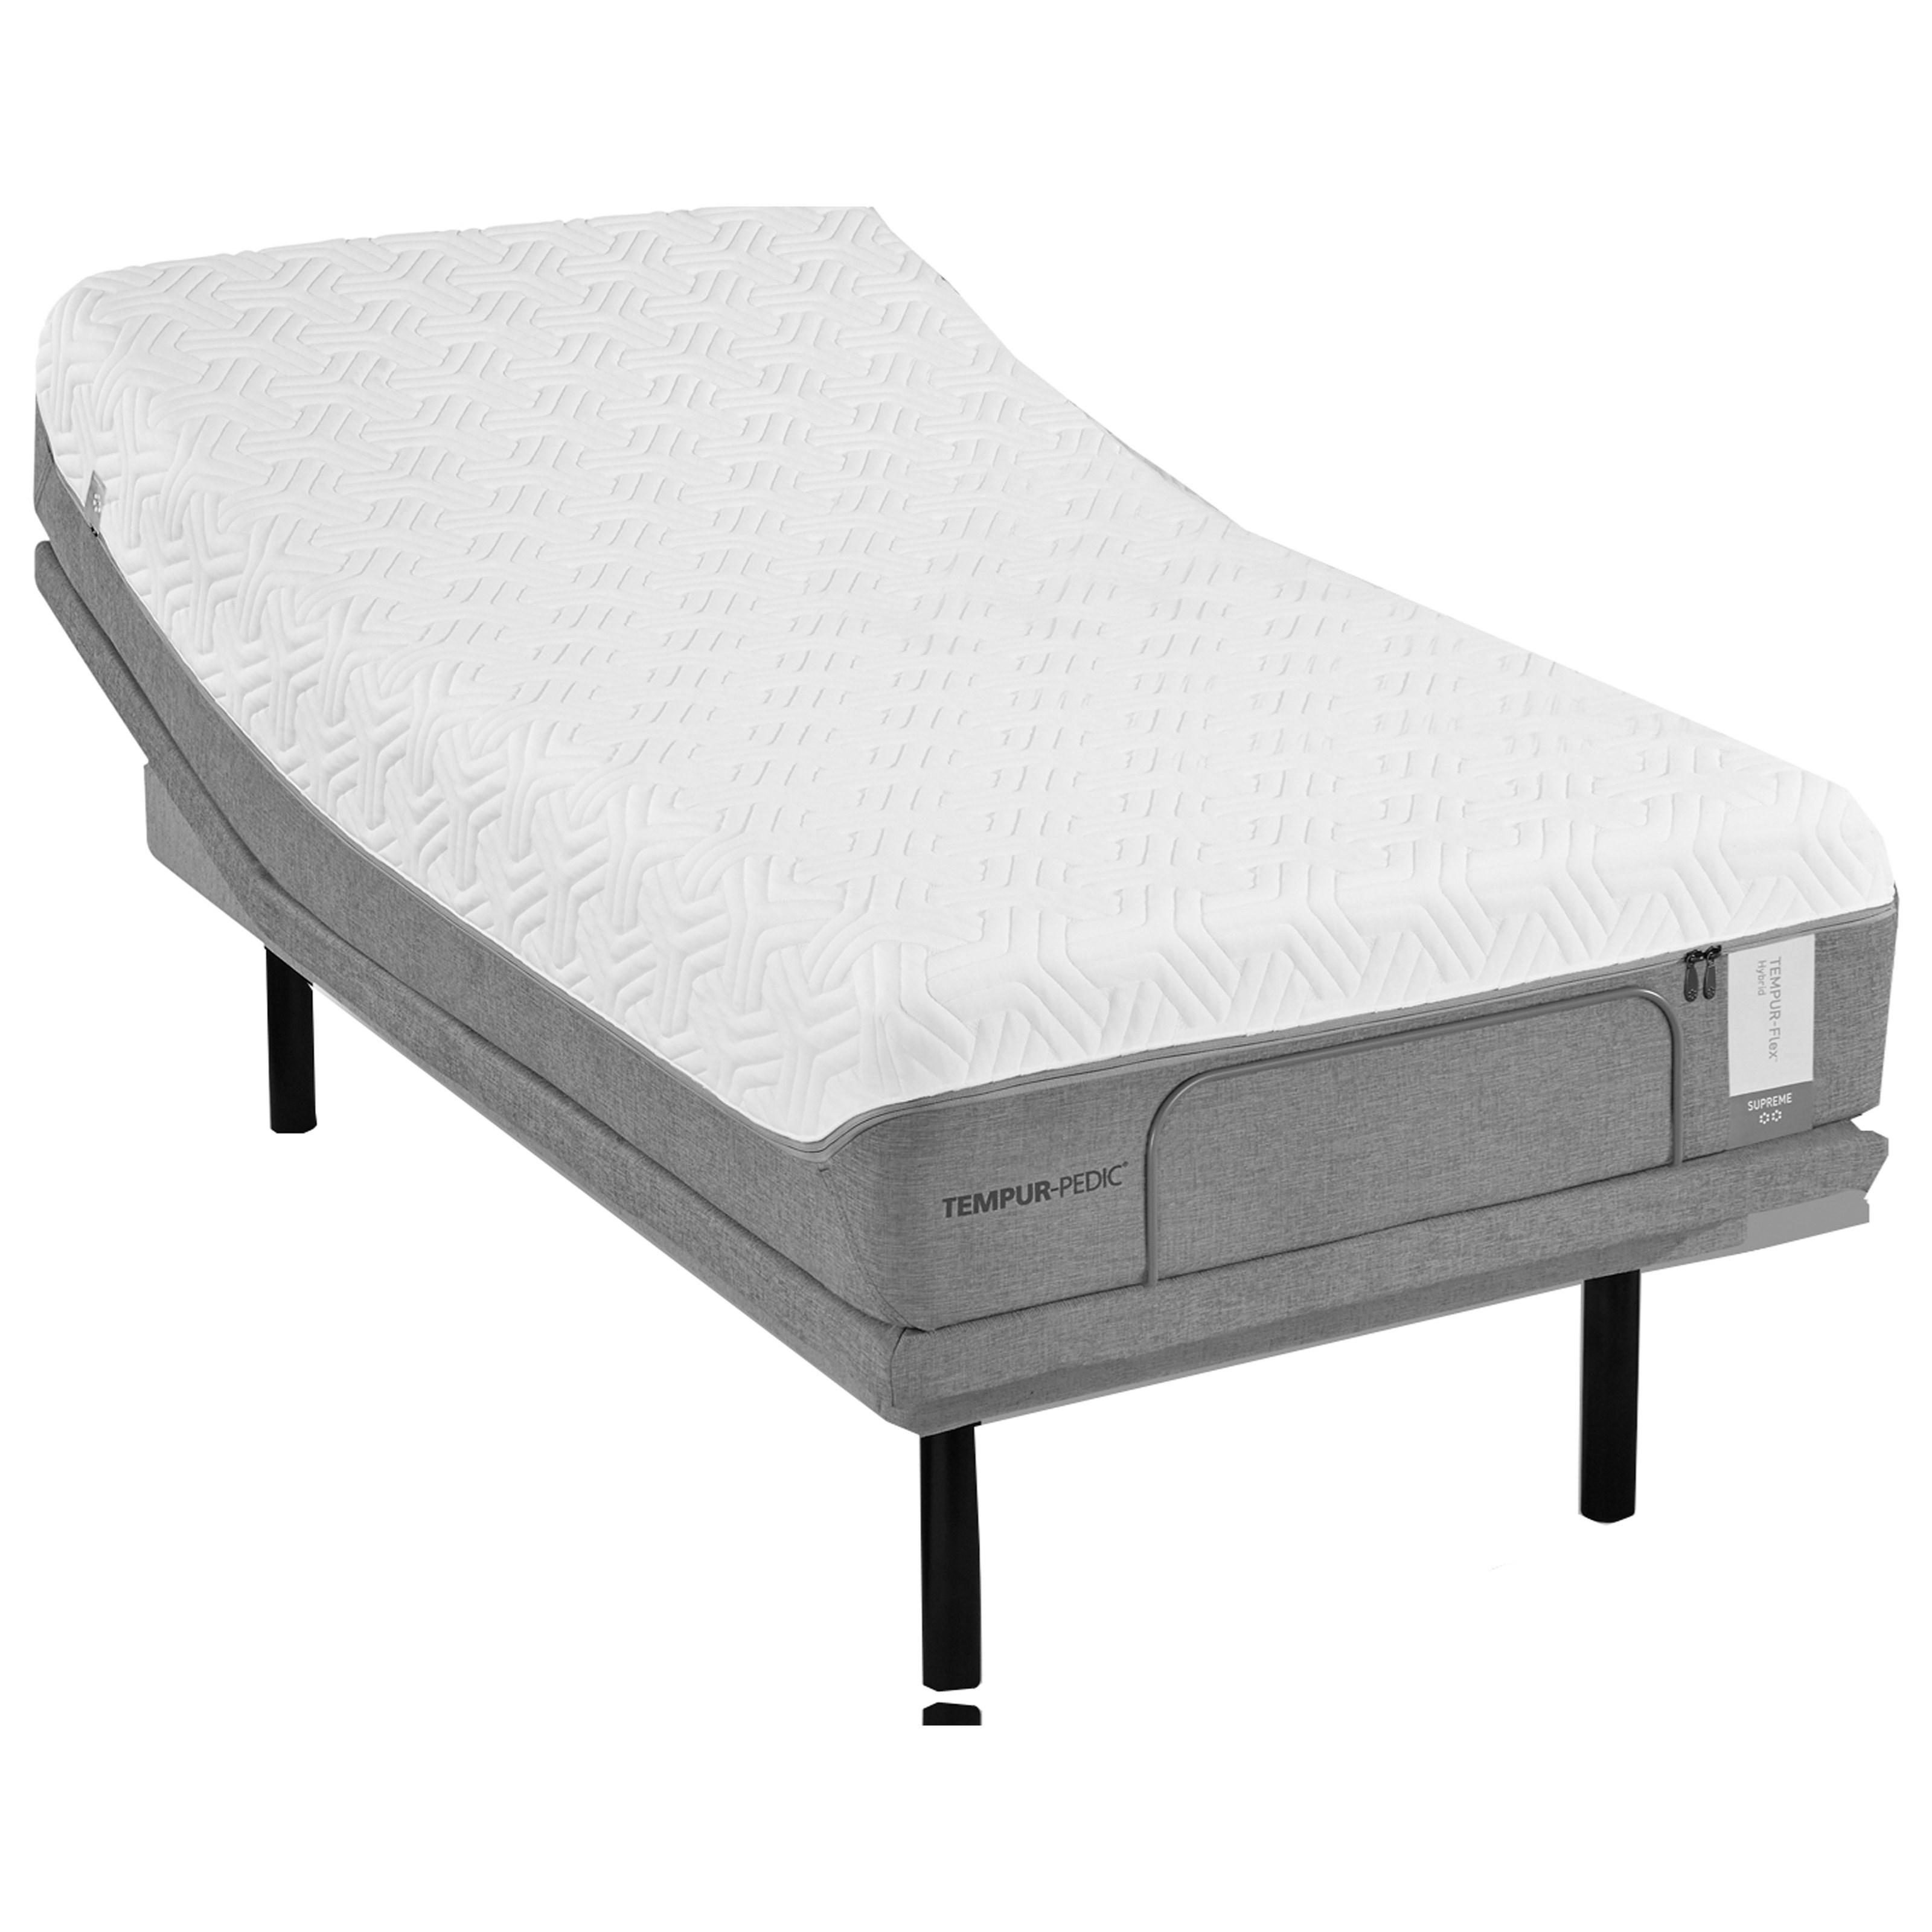 Tempur-Pedic® TEMPUR-Flex Elite King Medium Soft Plush Mattress Set - Item Number: 10117170+2x25289220